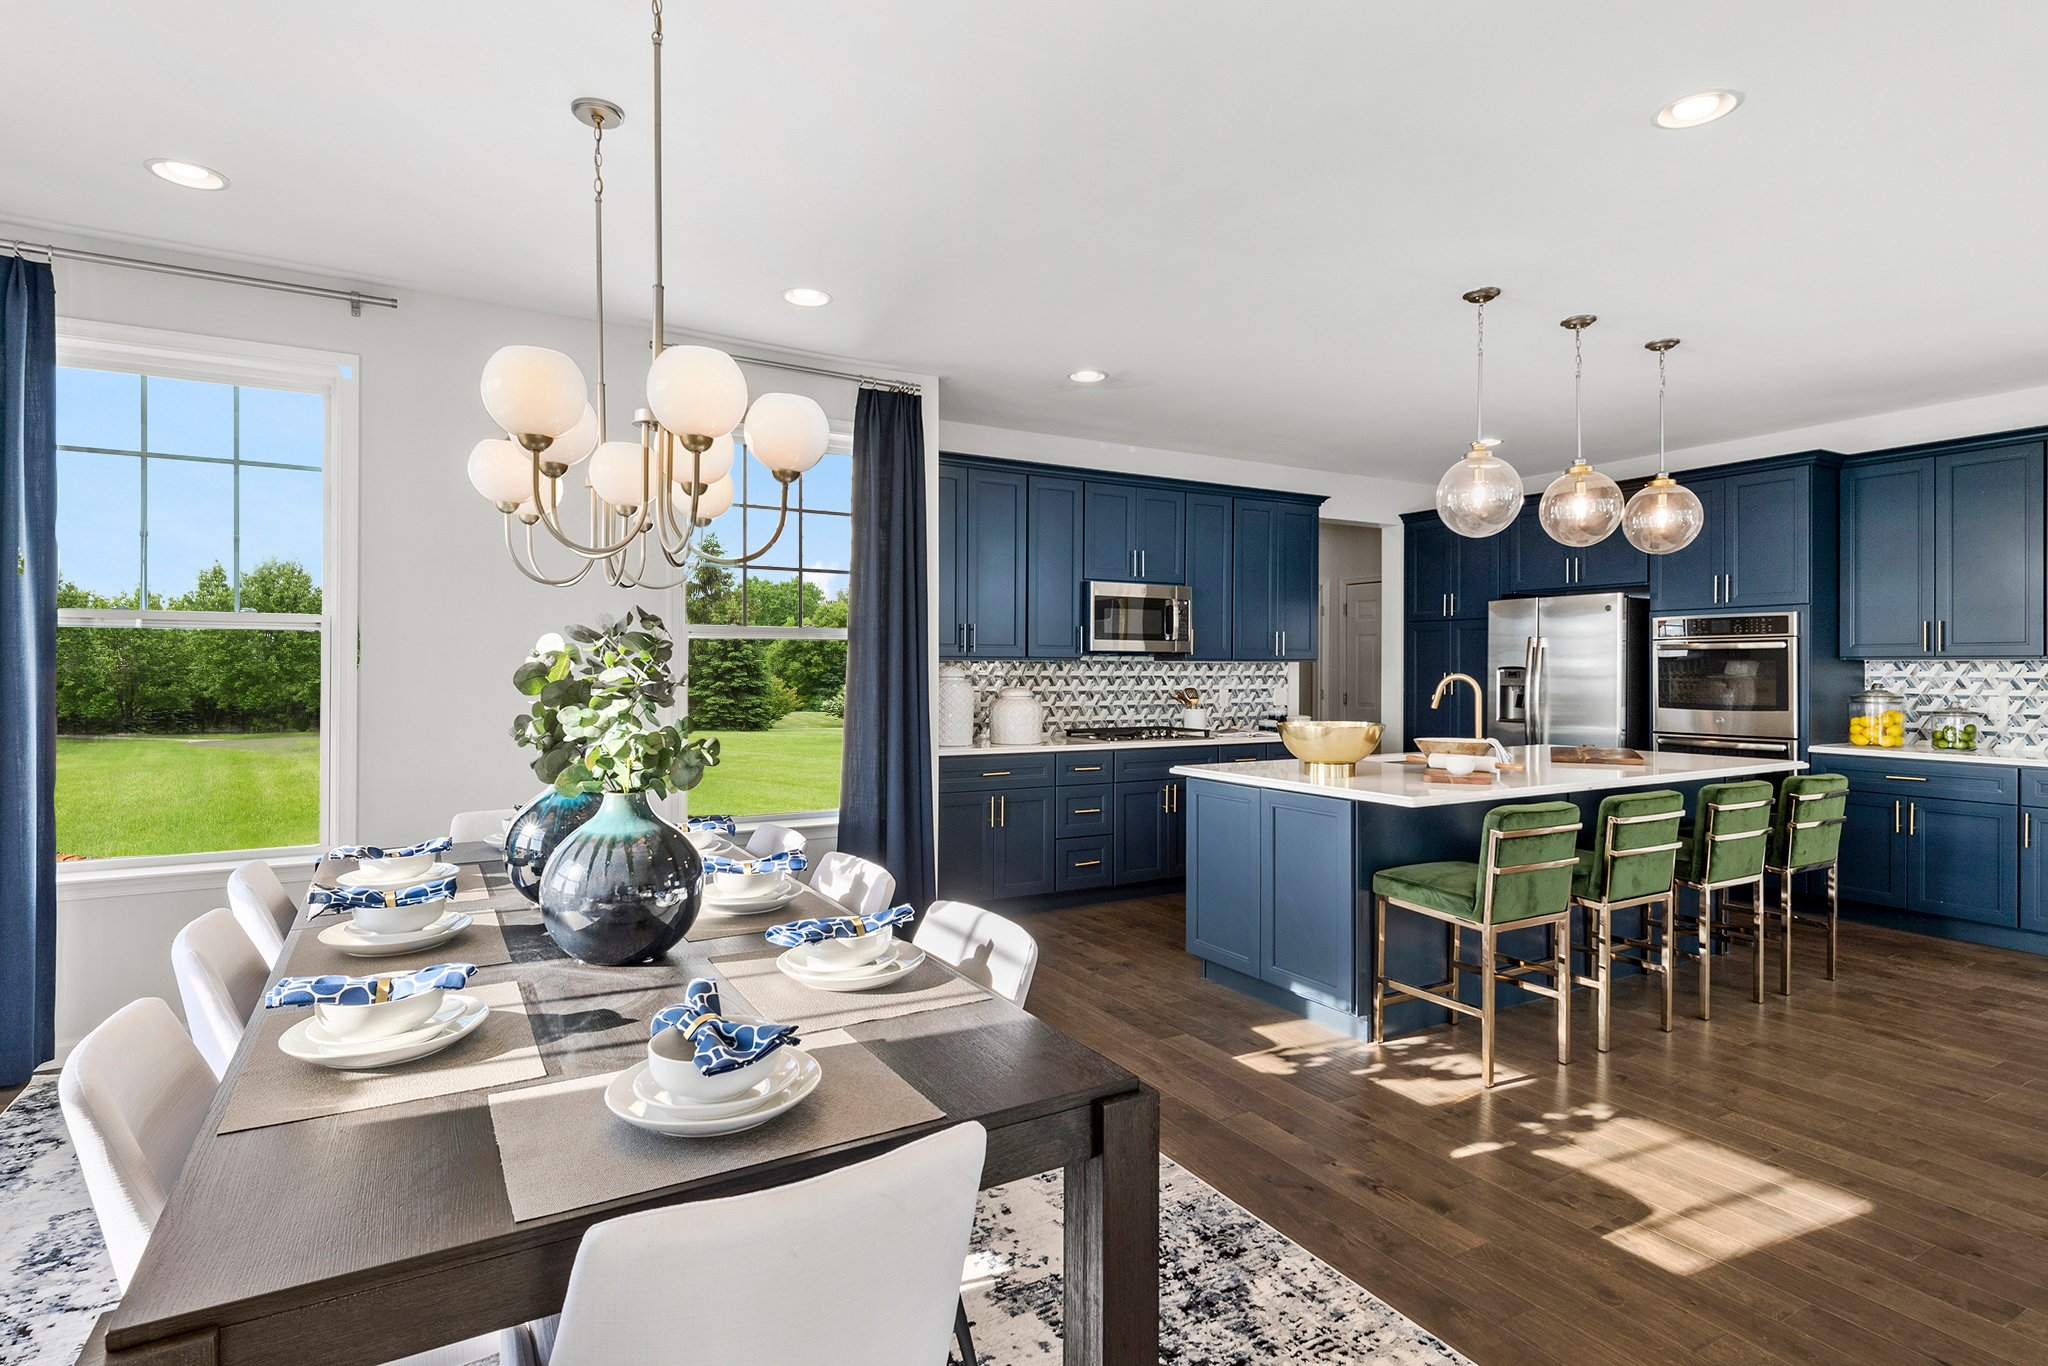 Multi-Generational Homes - Why a Larger Home May Make Sense